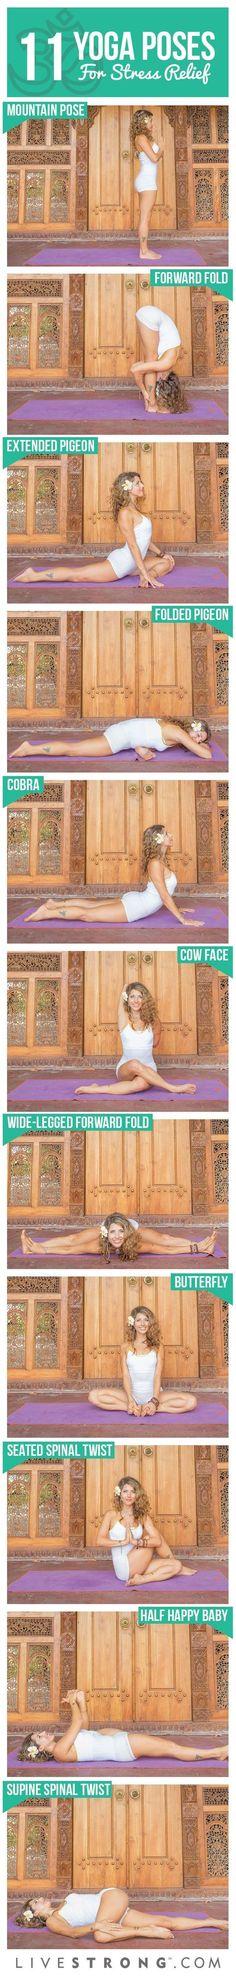 ૐ YOGA ૐ 11 Posturas de Yoga para Eliminar Tensión A partir de Su Día